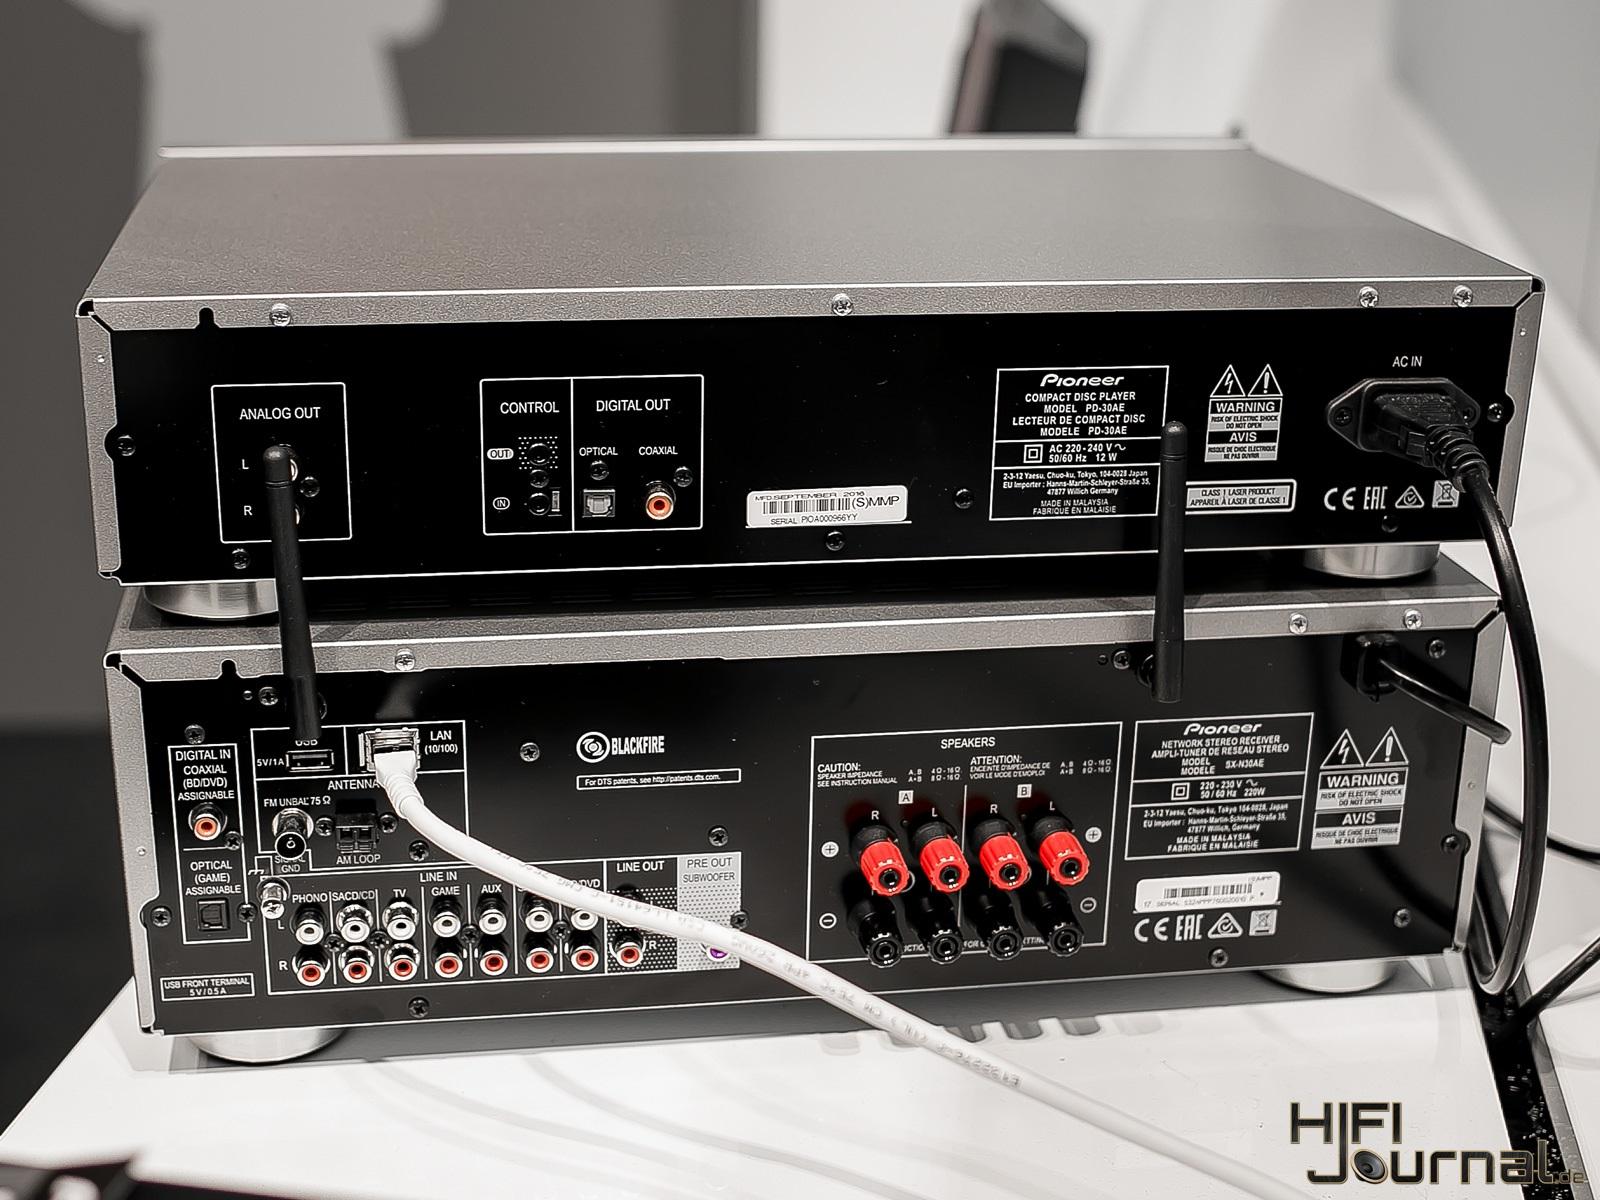 how to pioneer avh-4400 firmware update